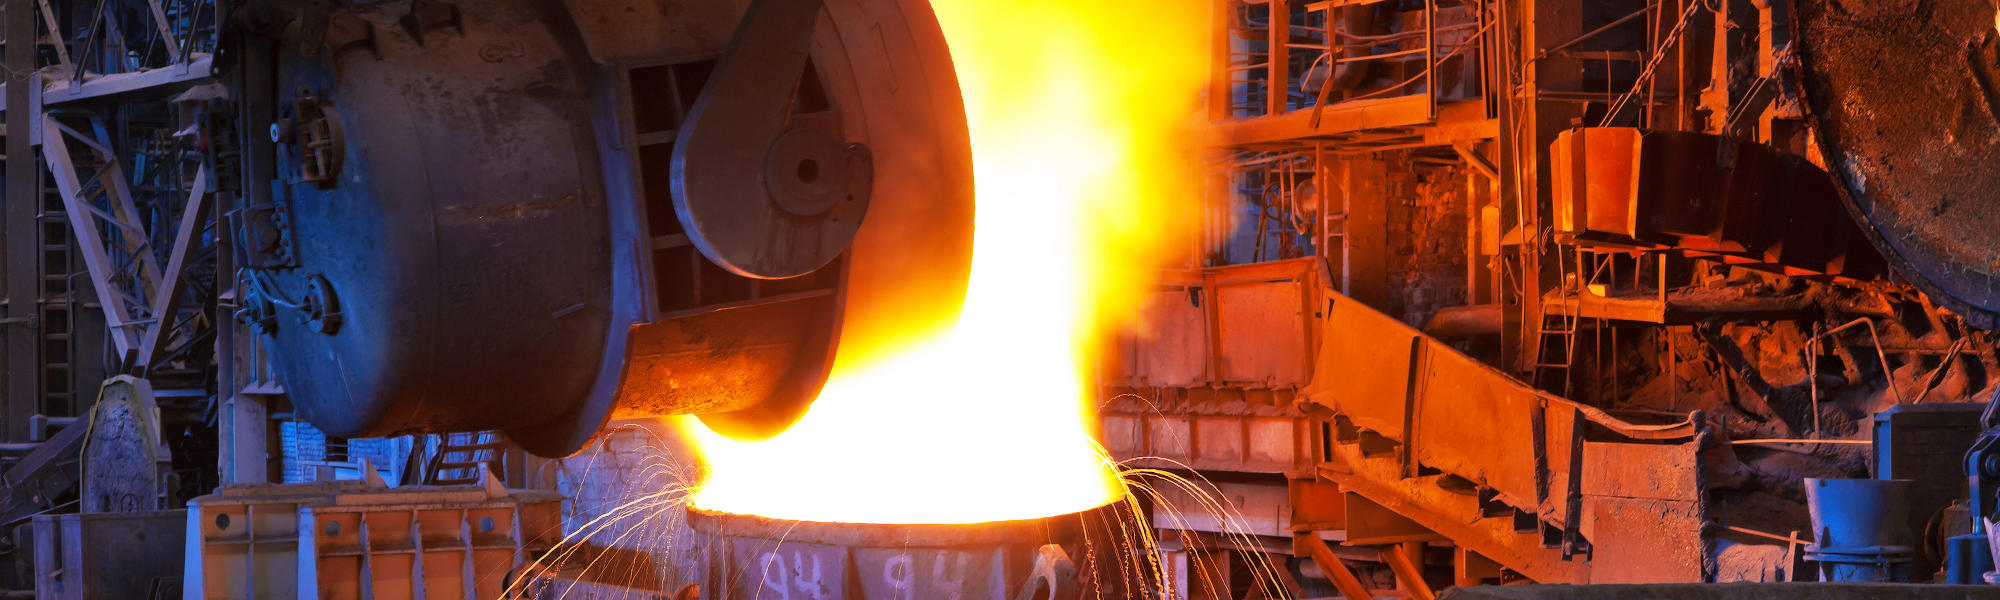 siderurgia/metalurgia